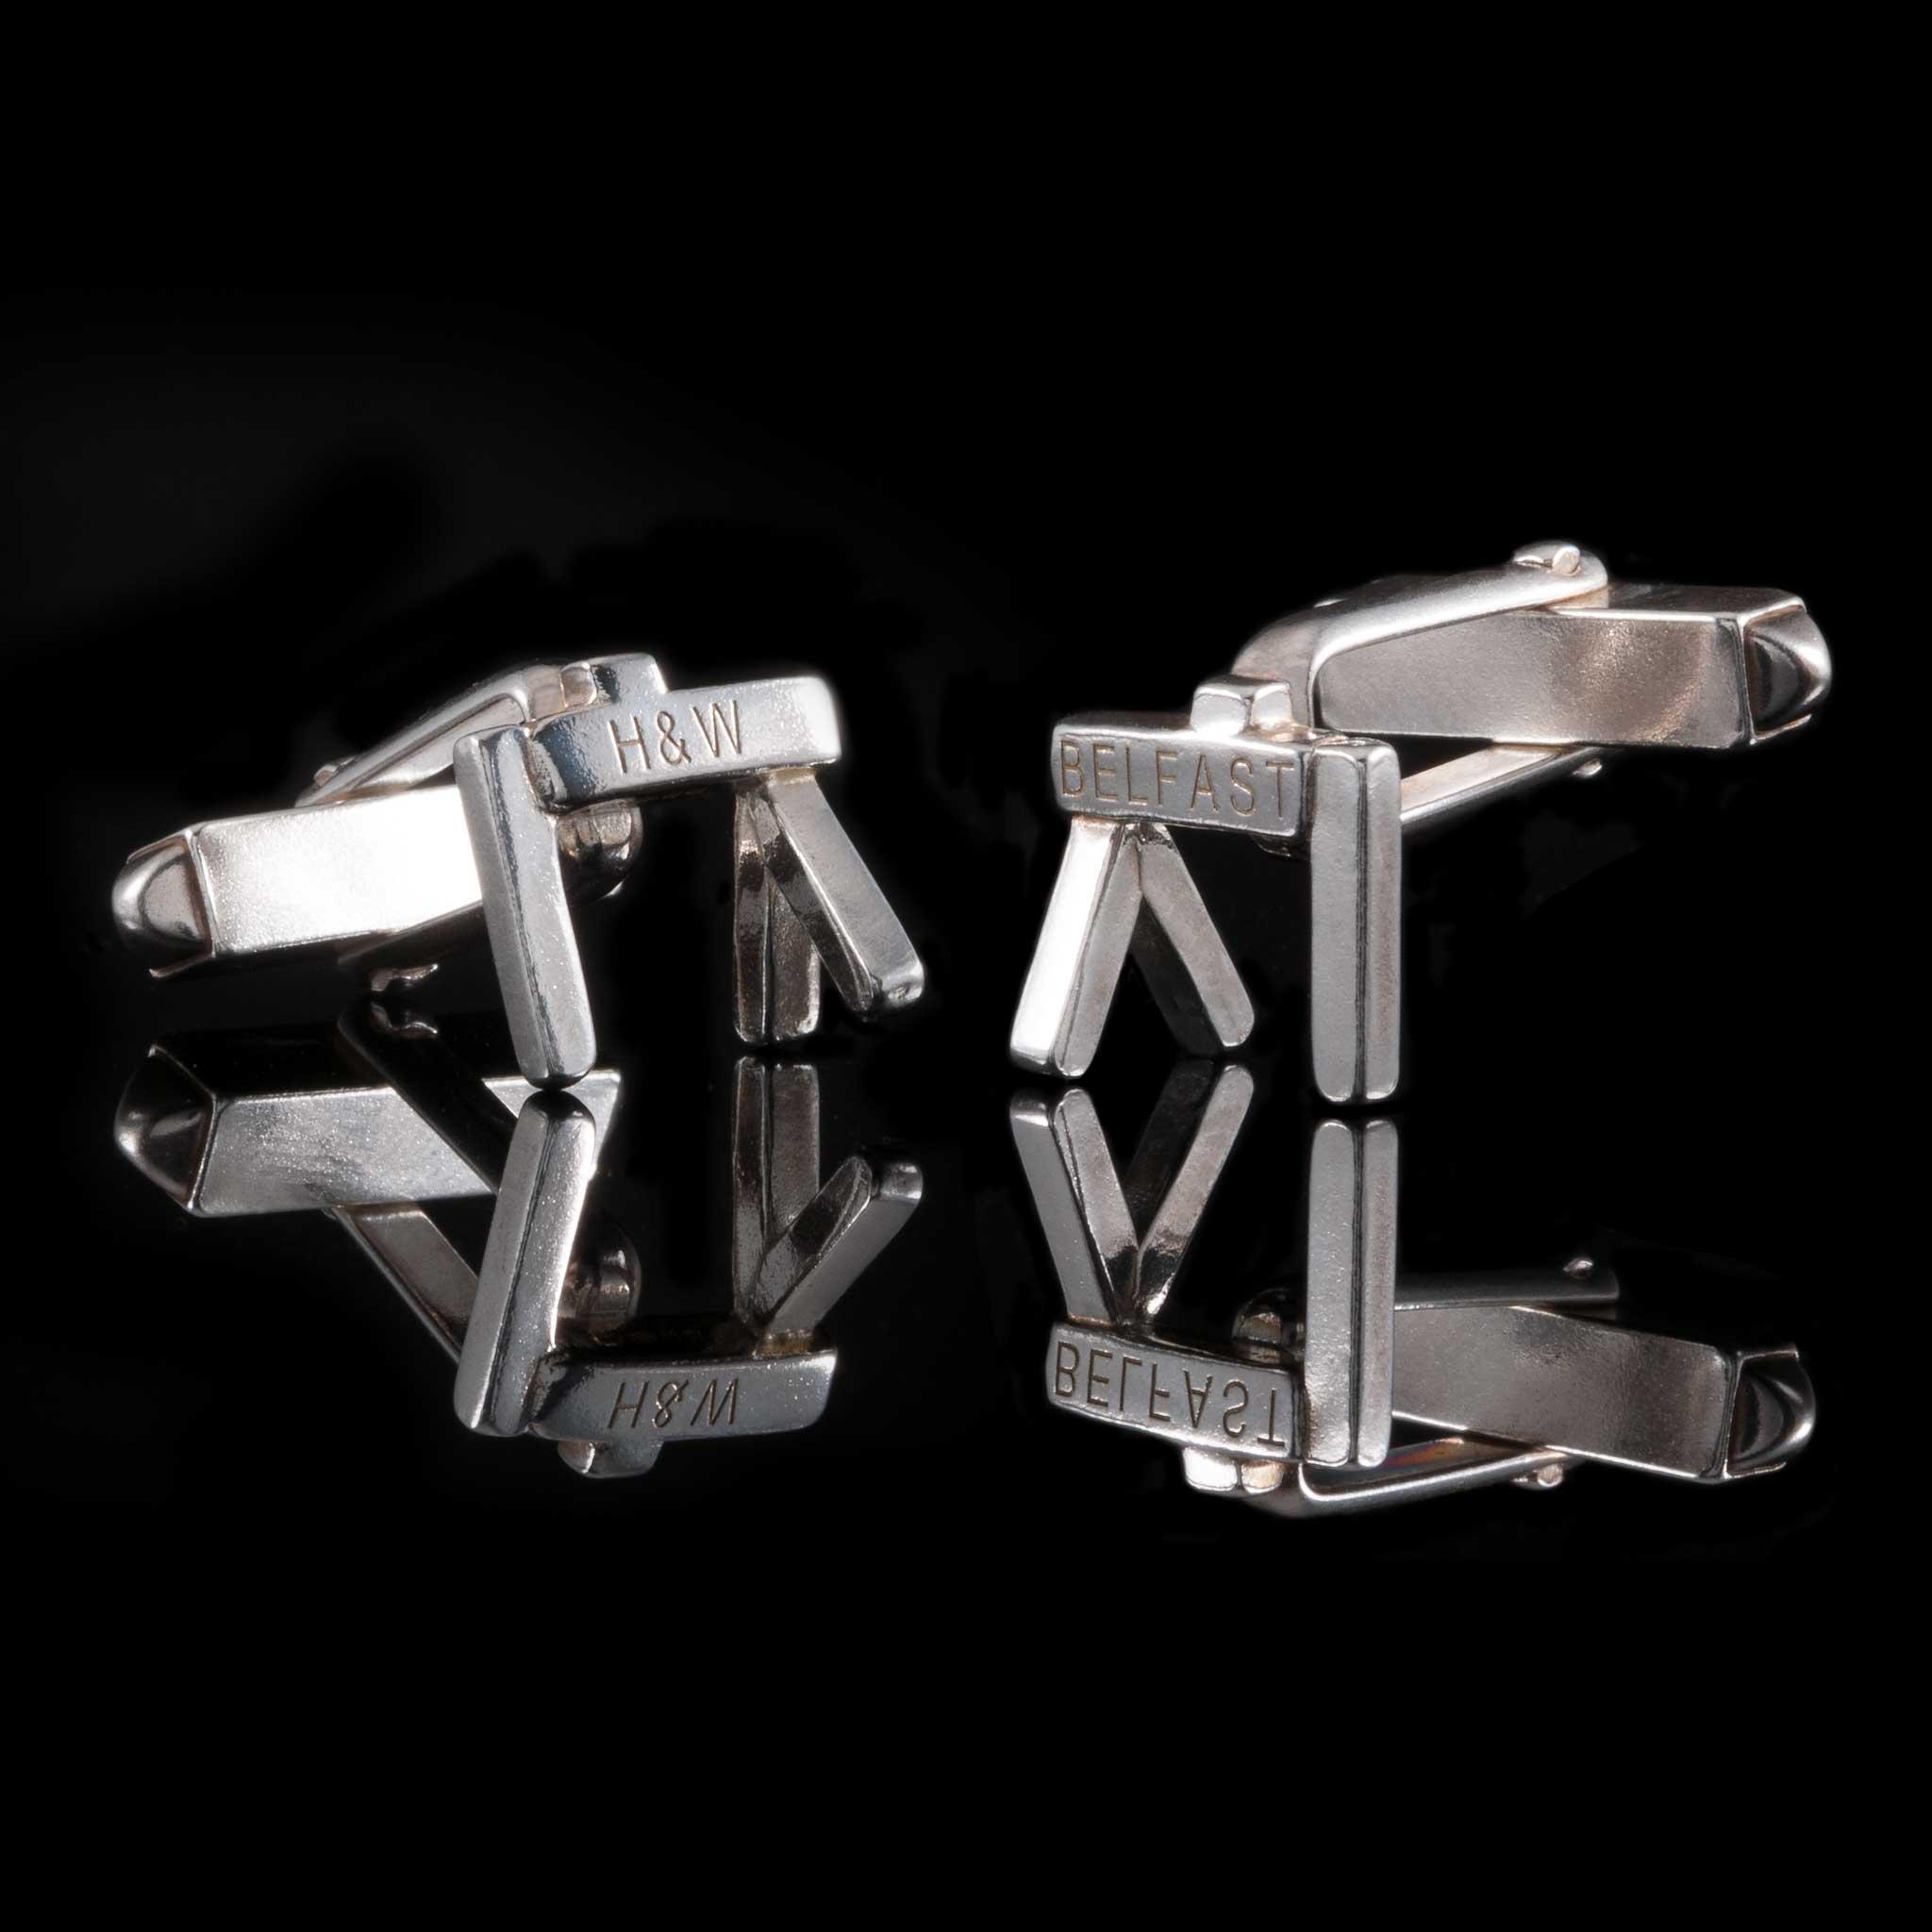 Northern-Ireland-Silver-Jewellery-Belfast-Crane-Cufflinks.jpg